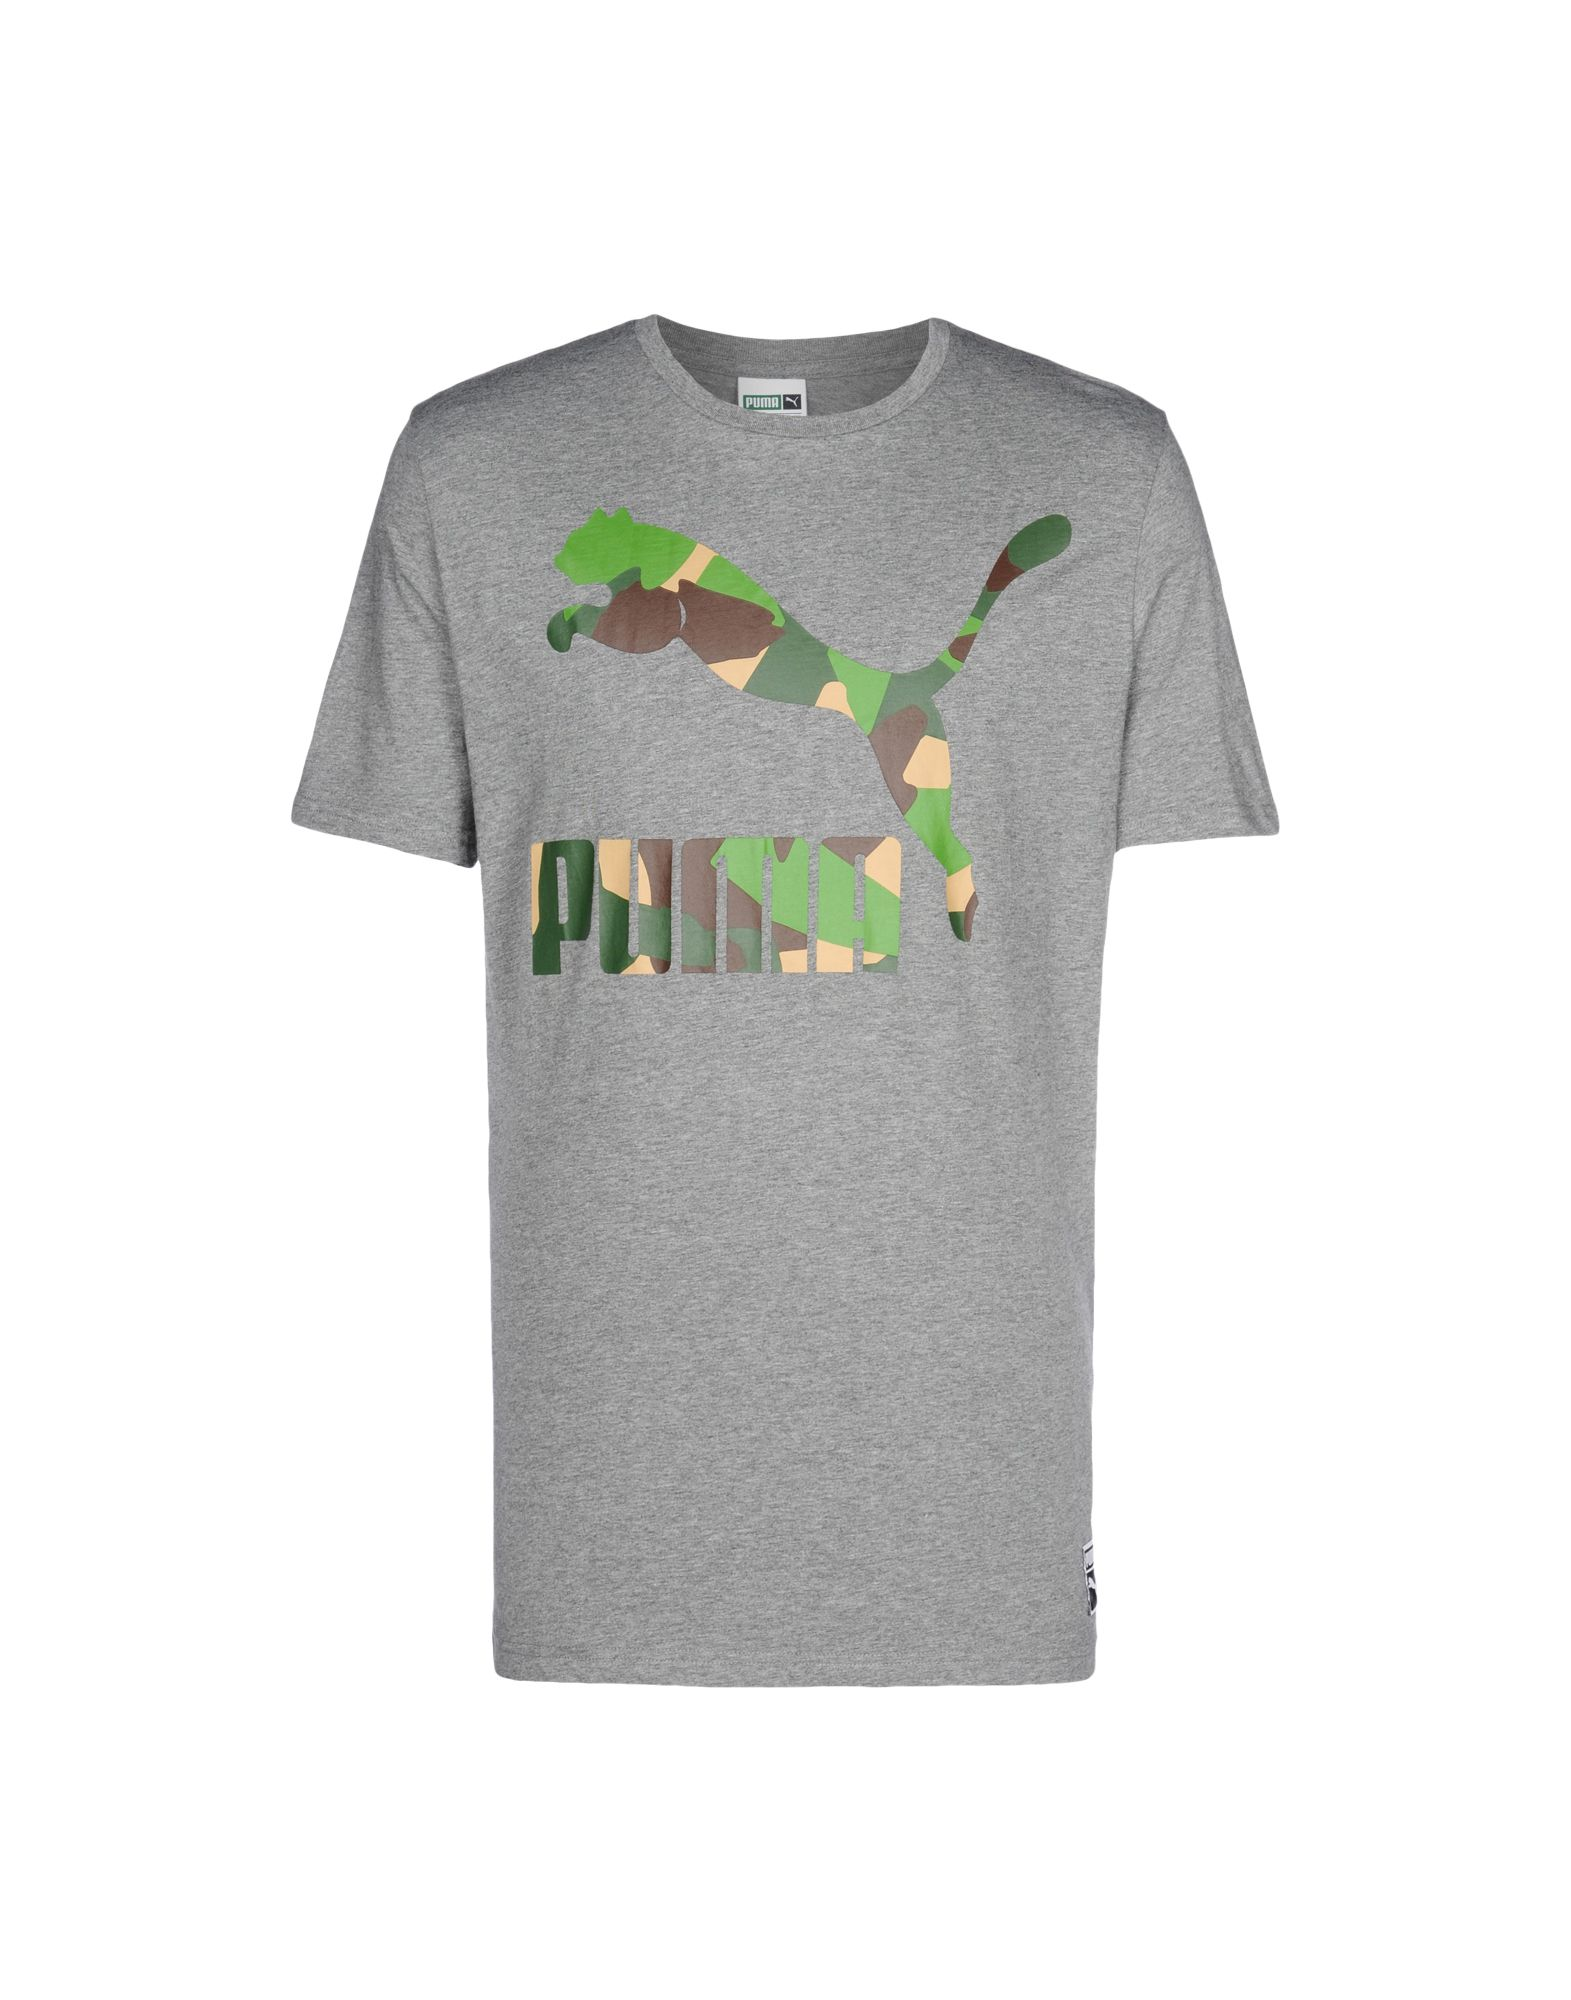 Puma 571203-Camo Archive Tee - Sports T-Shirt - Men Puma Sports T-Shirts  online on YOOX United States - 37851088PK